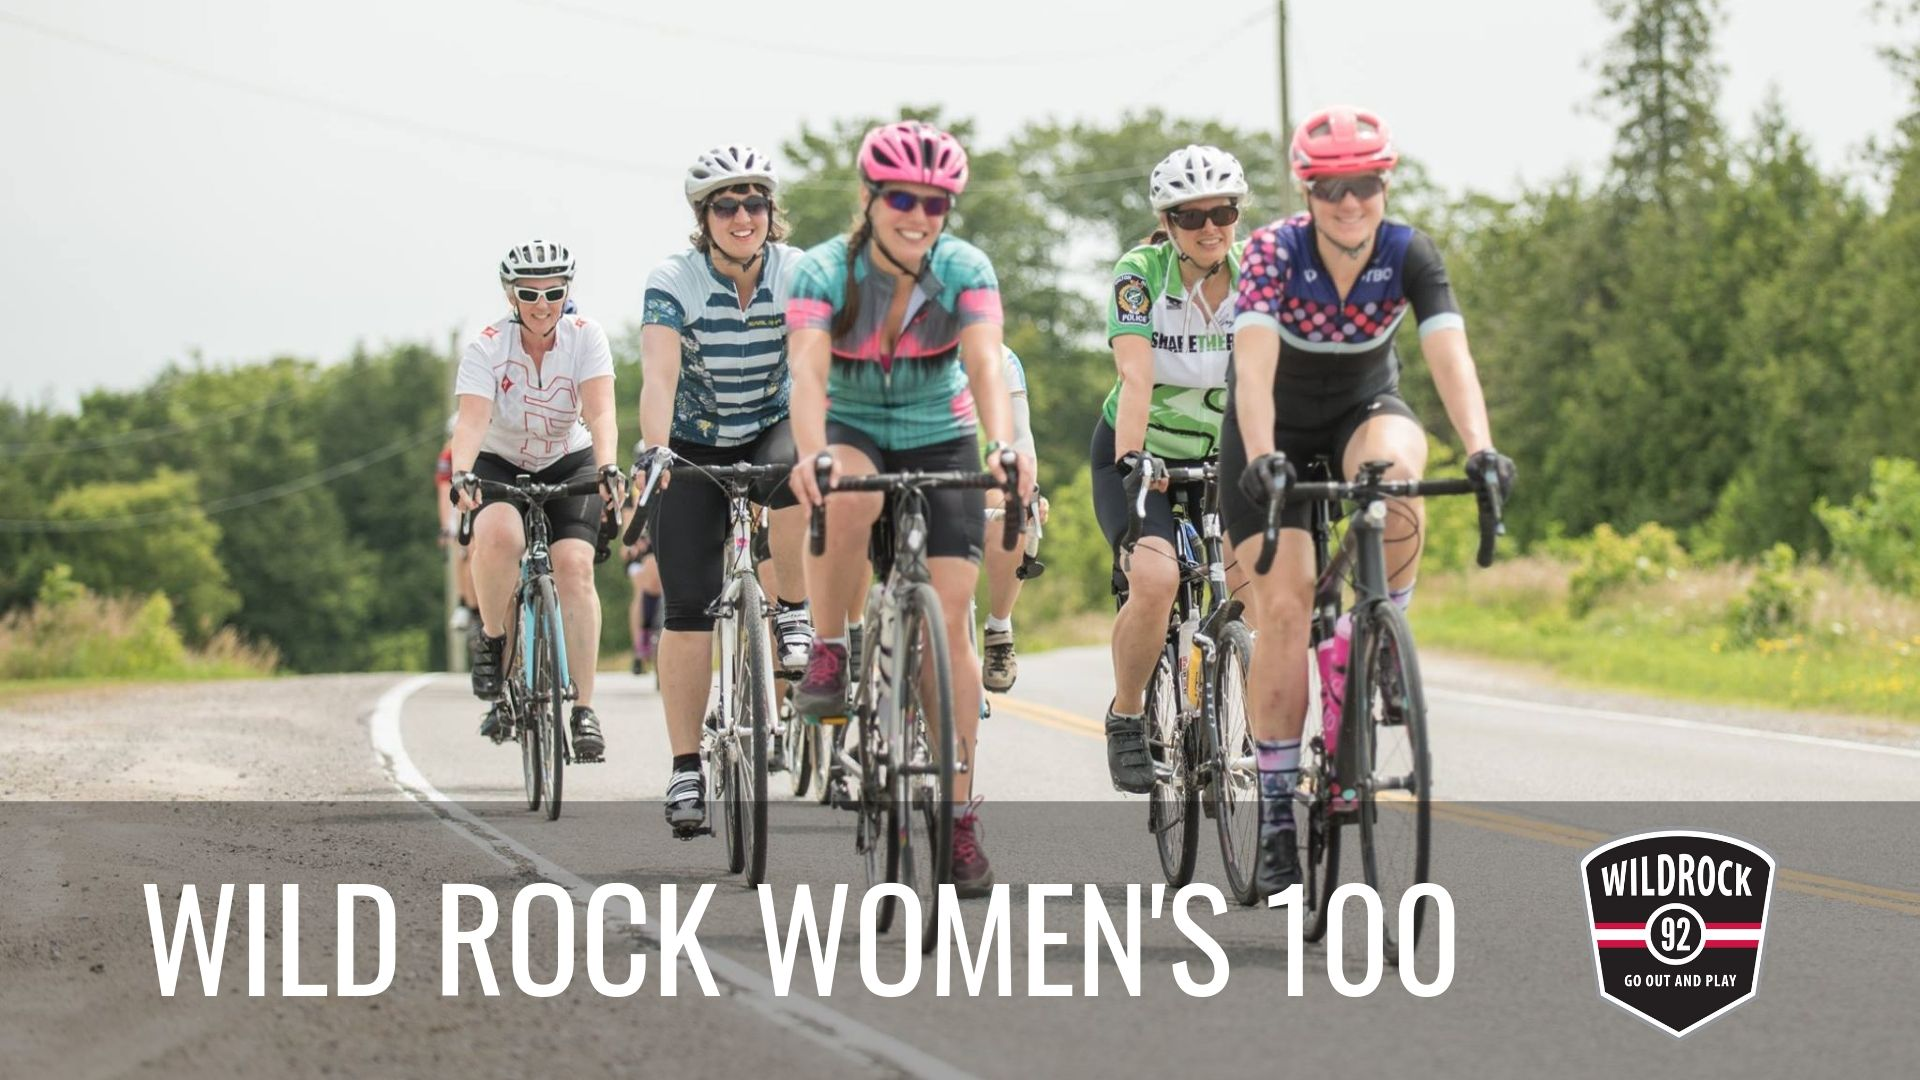 WILD ROCK WOMEN'S 100 (1).jpg